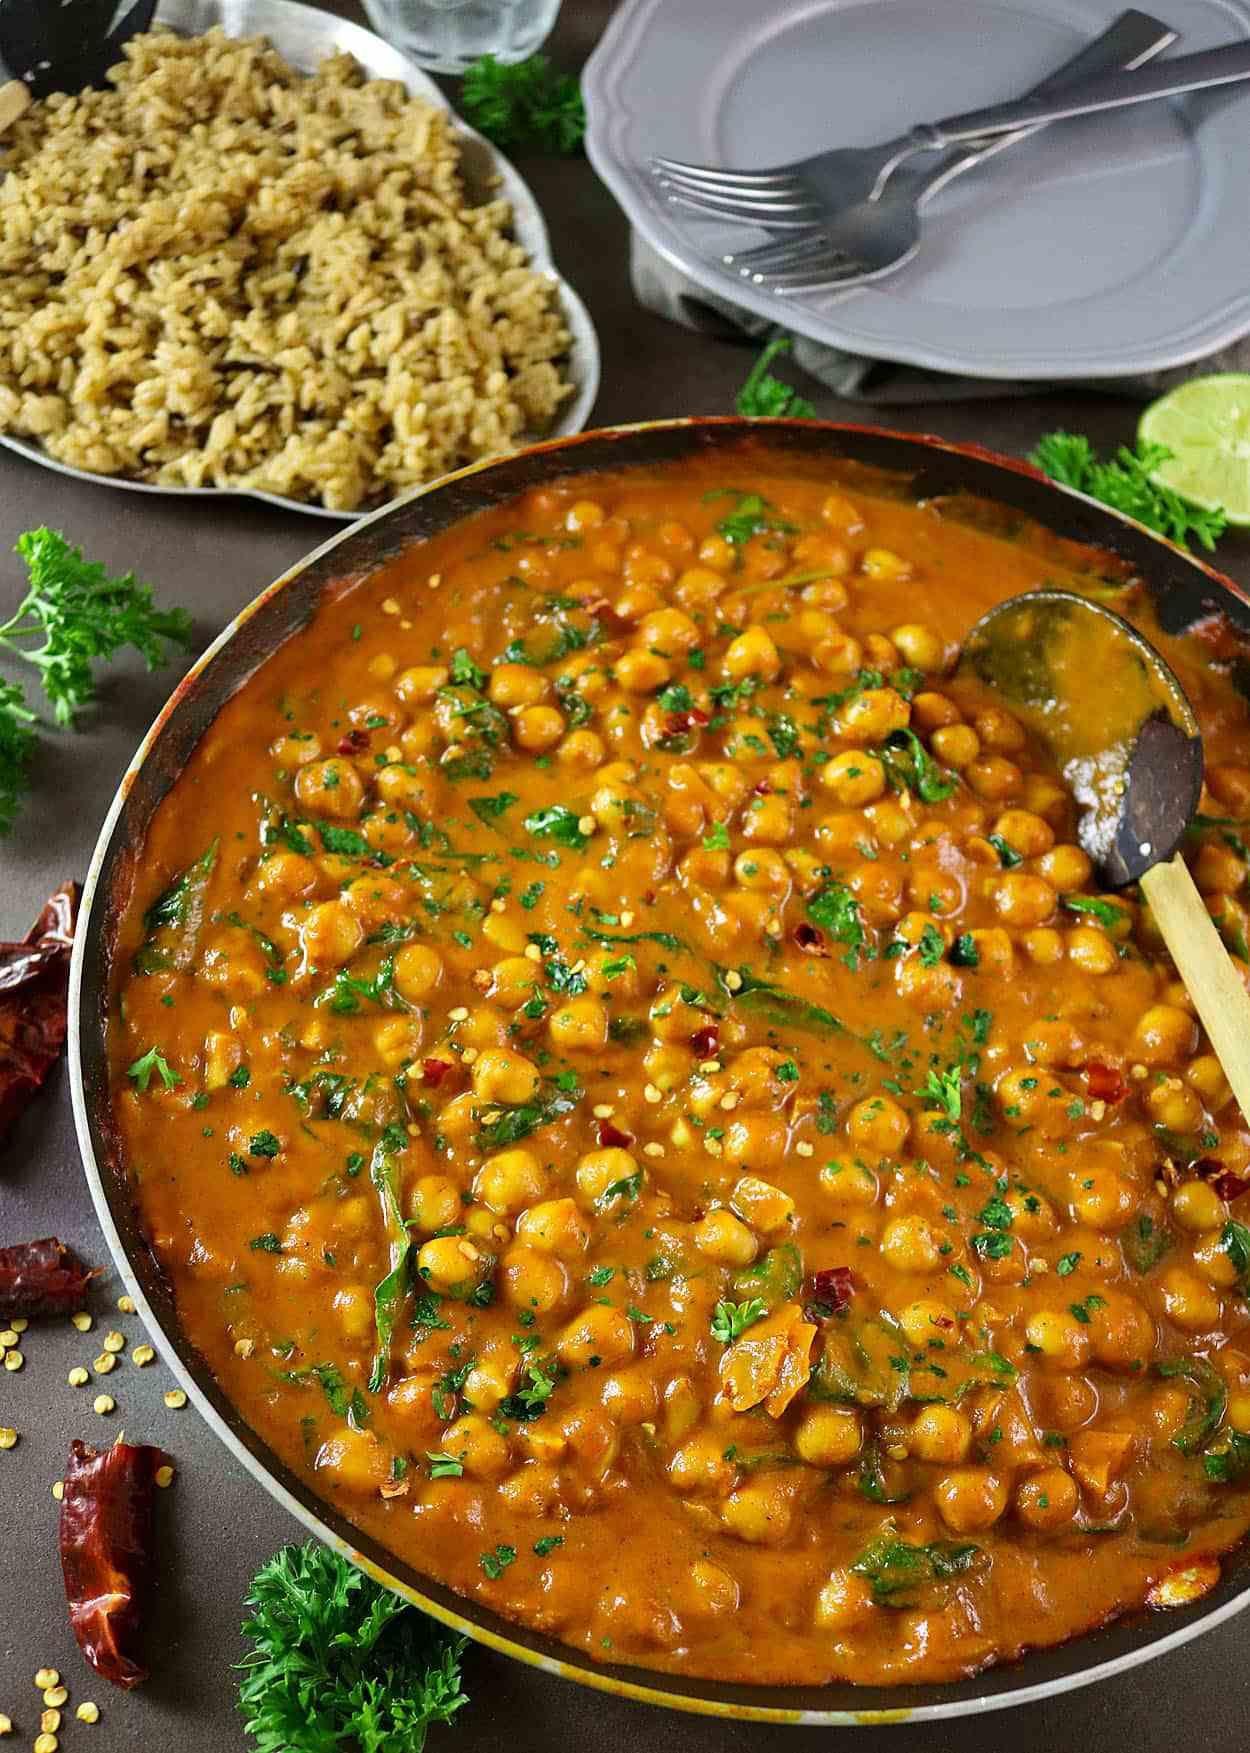 Easy Chickpea Spinach Curry Recette Recettes De Cuisine